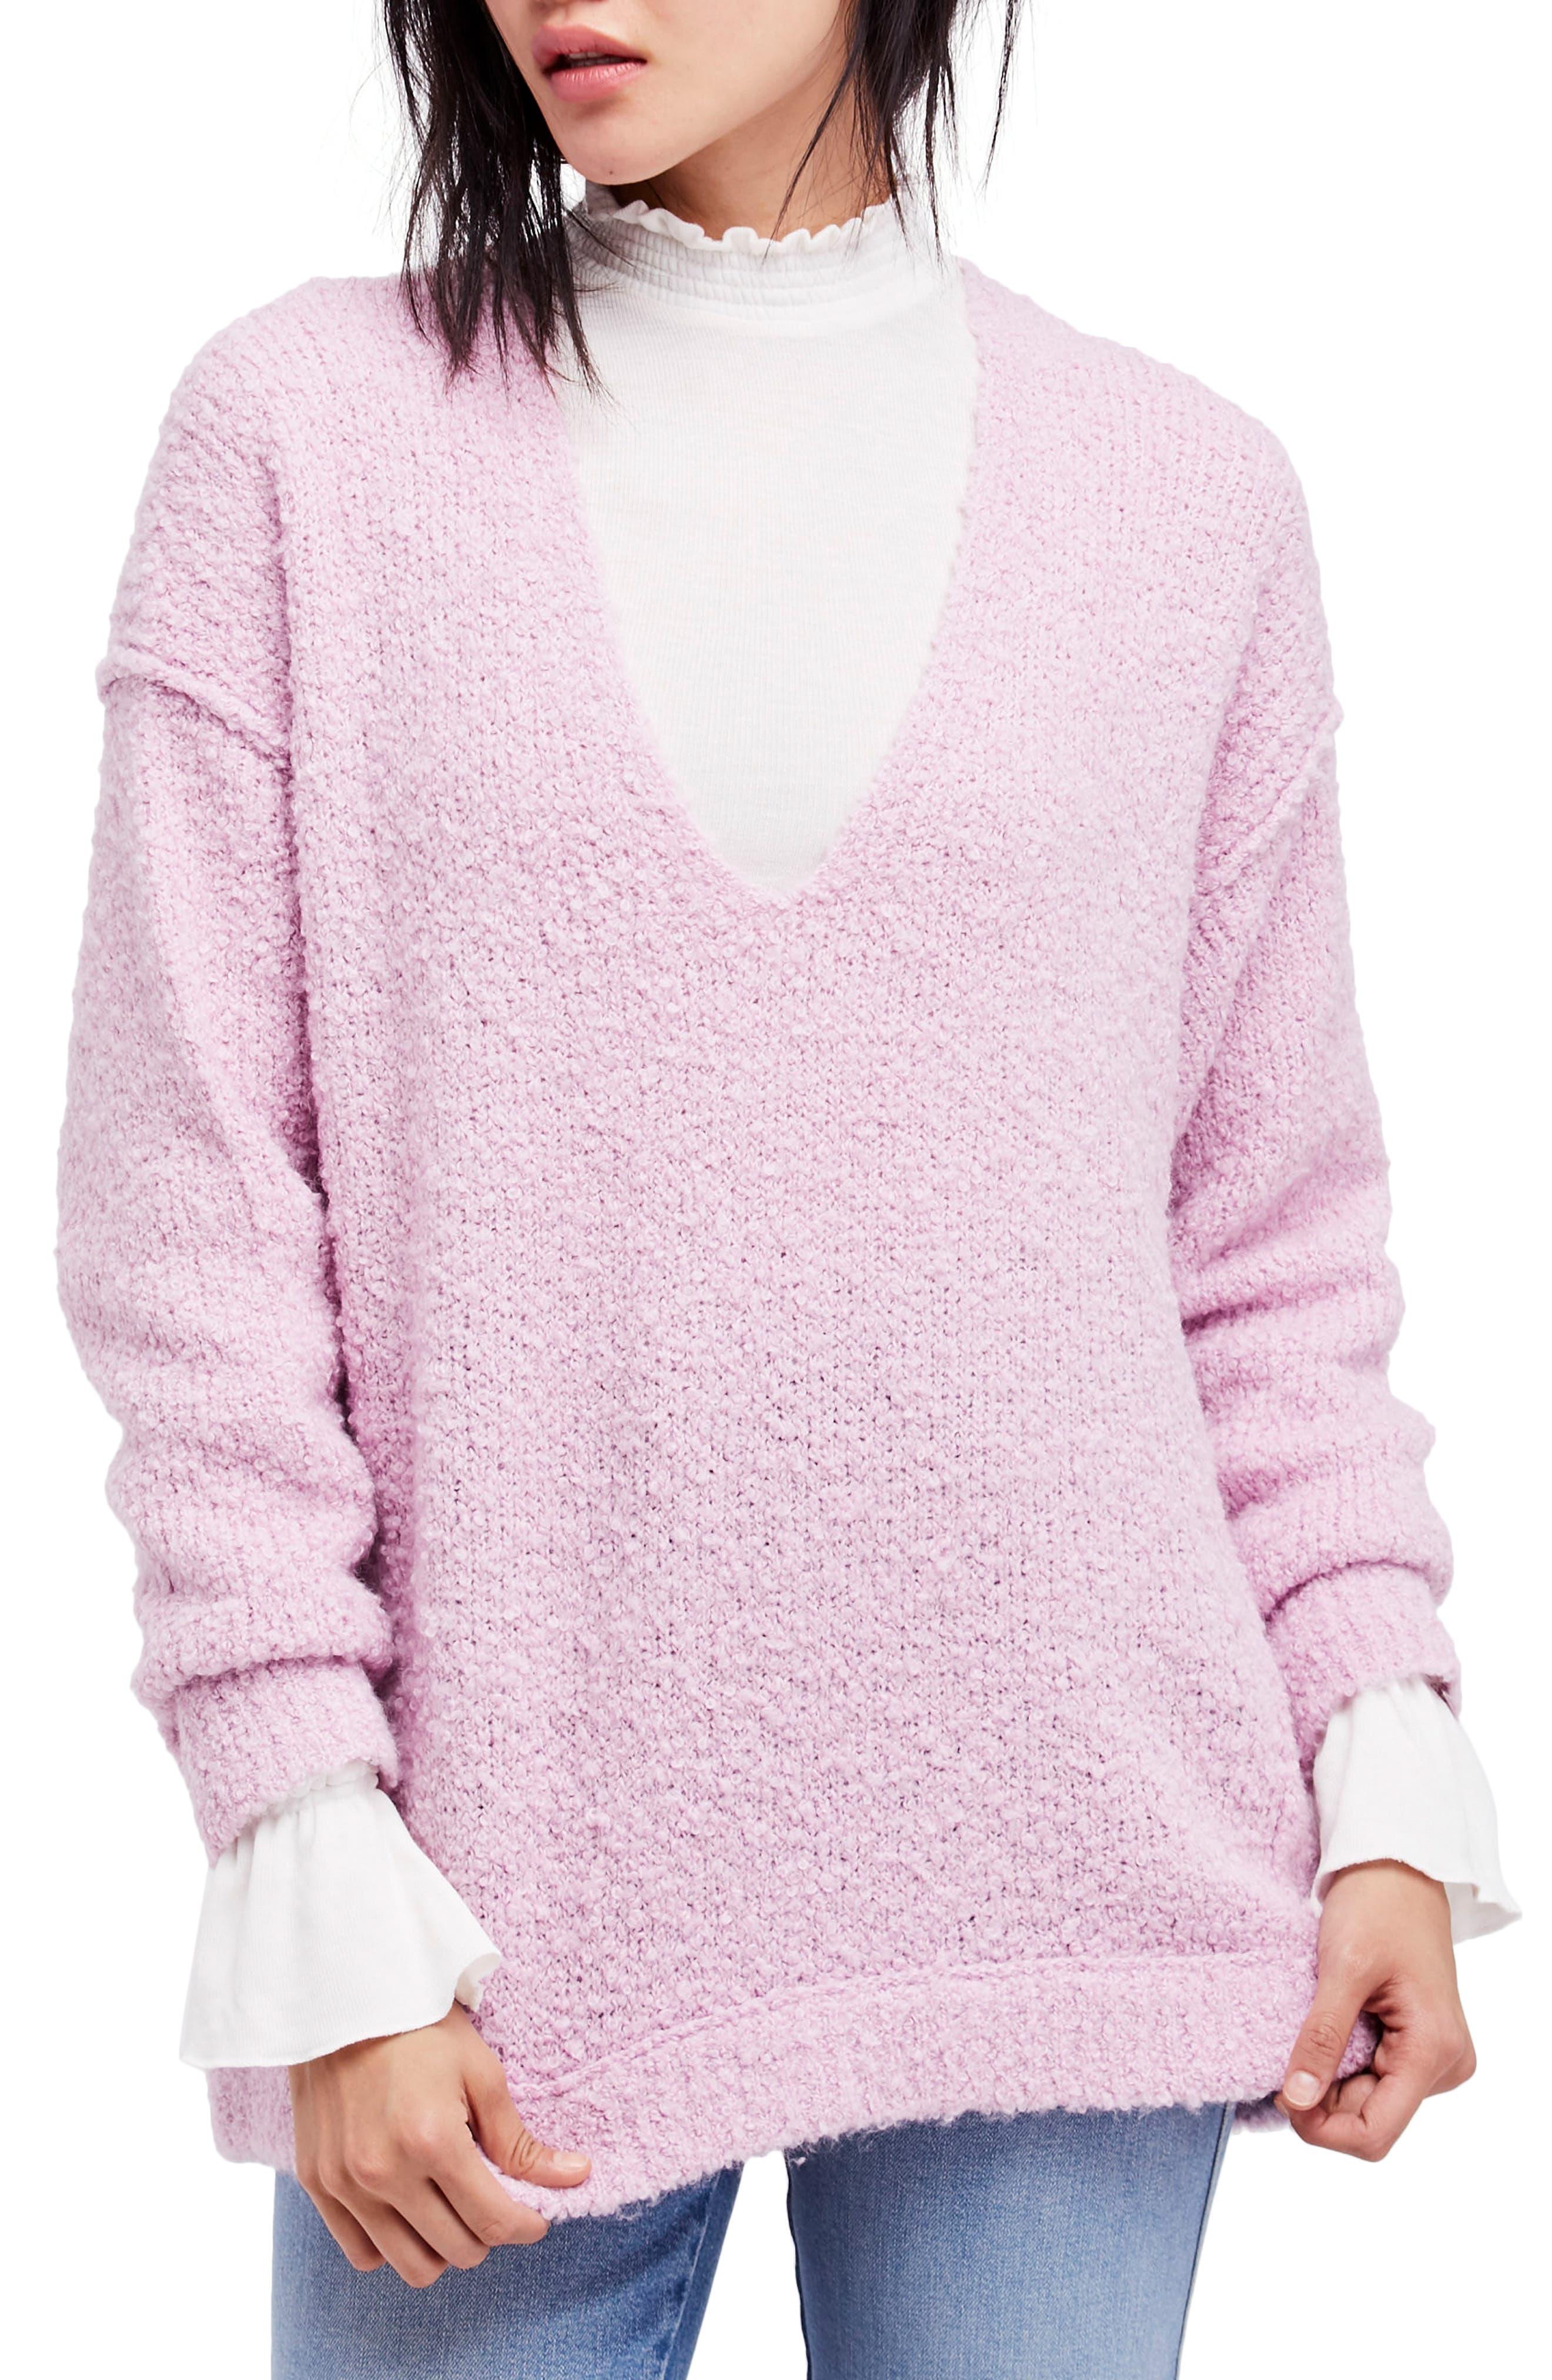 Lofty V-Neck Sweater,                         Main,                         color, Light Purple